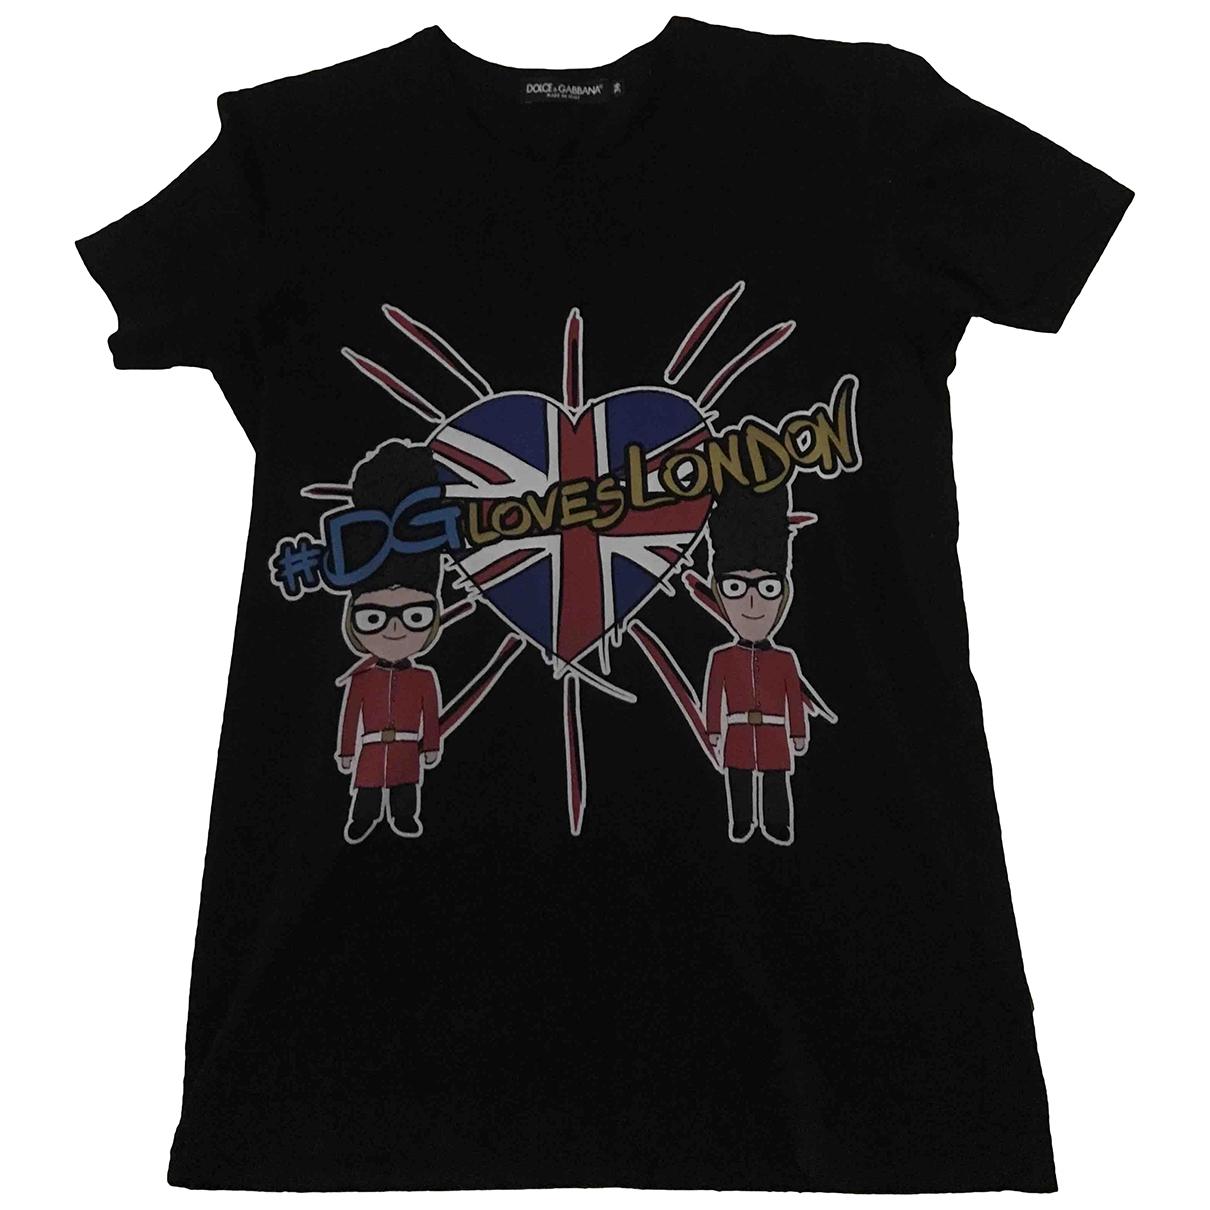 Dolce & Gabbana \N Black Cotton  top for Women 36 IT